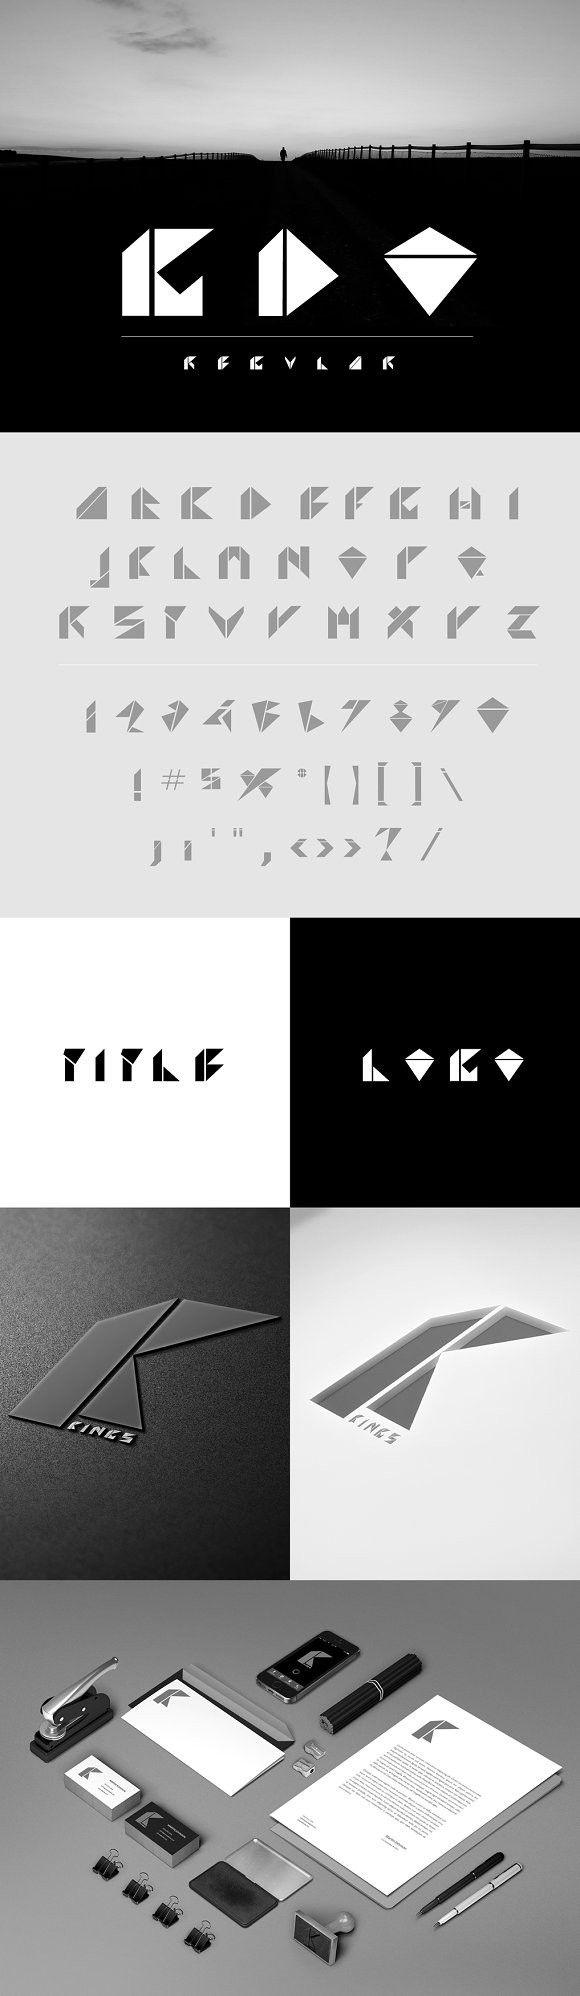 483 Best Symbol Fonts Images On Pinterest Best Fonts 16 Bit And Game